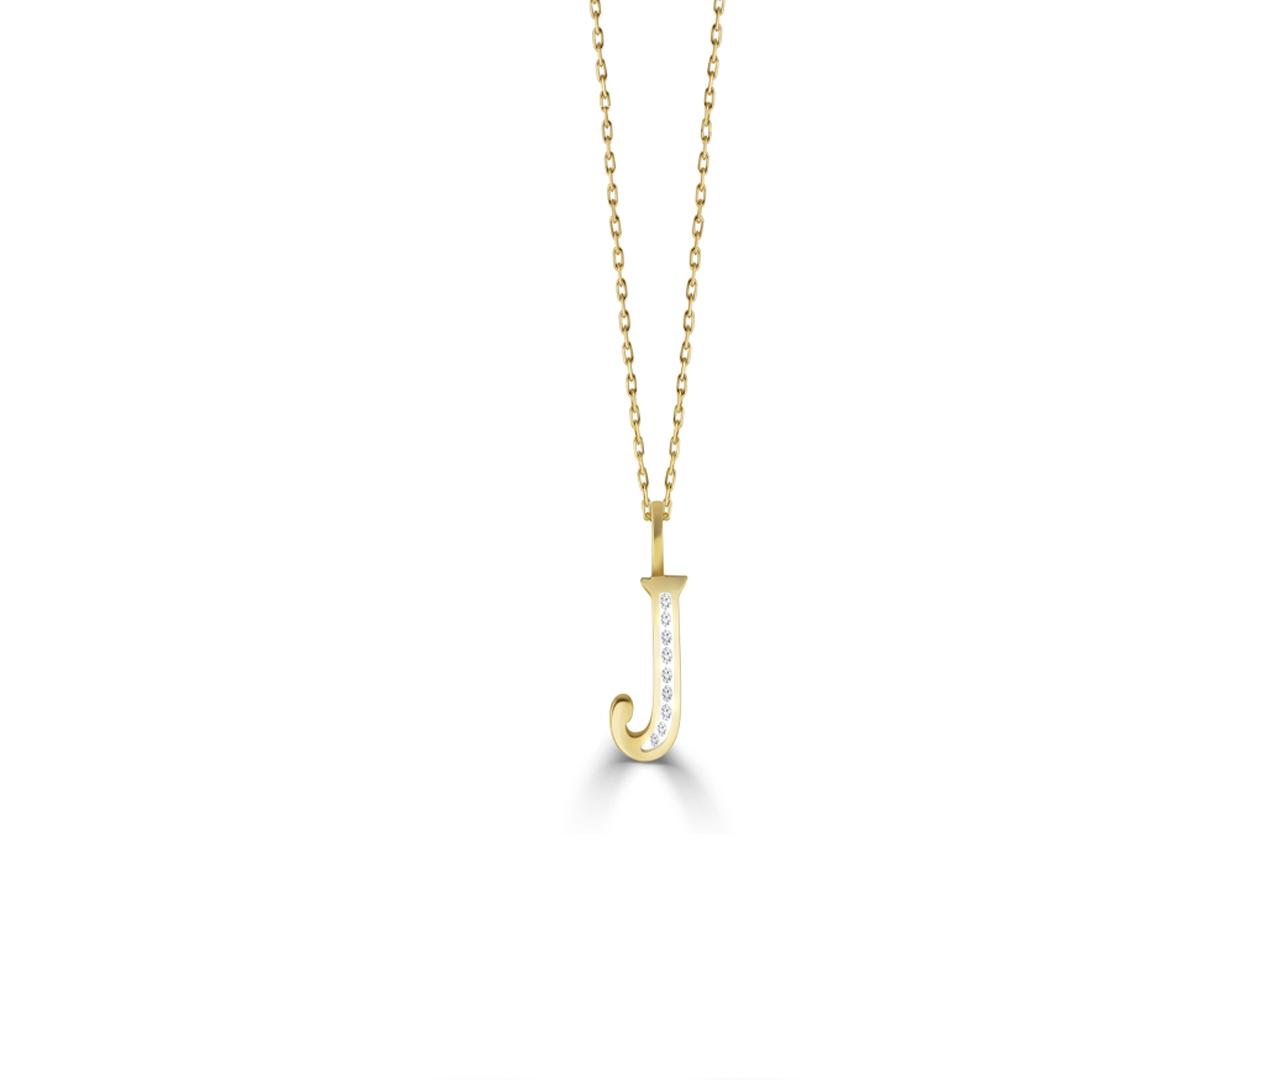 J' Alphabet Pendant chain with Diamonds